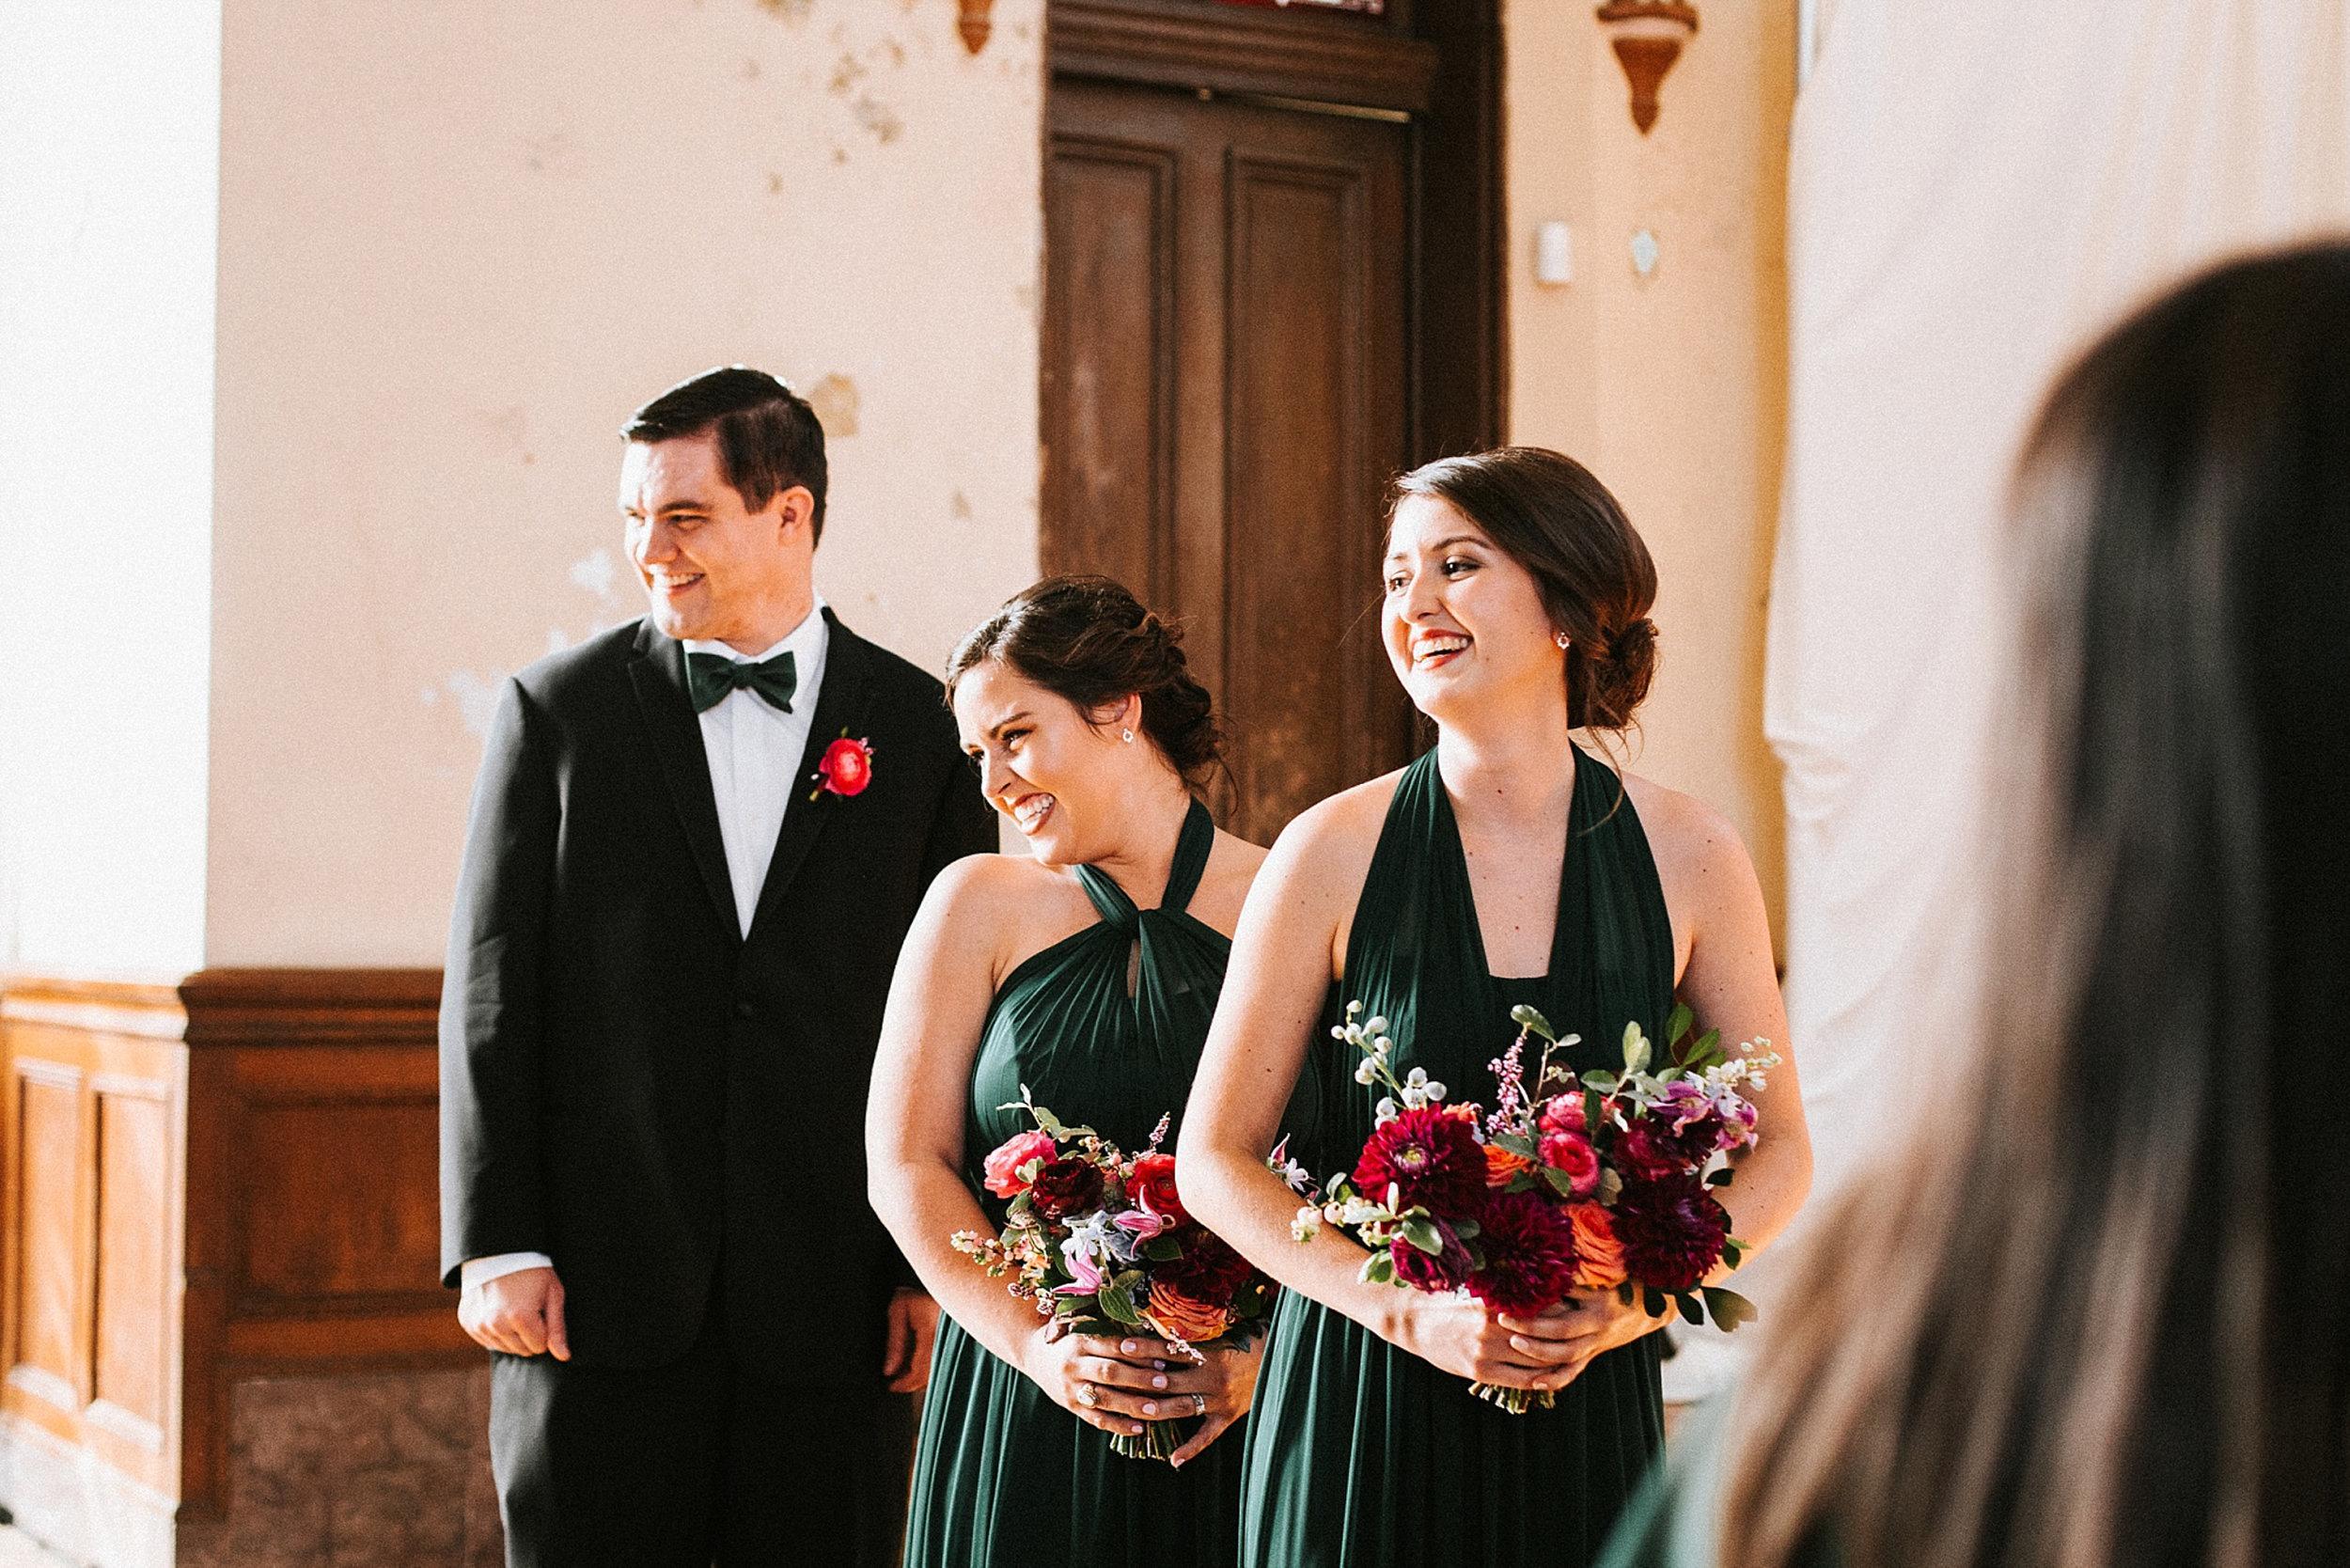 Brooke Townsend Photography - Ohio Wedding Photographer-111.jpg